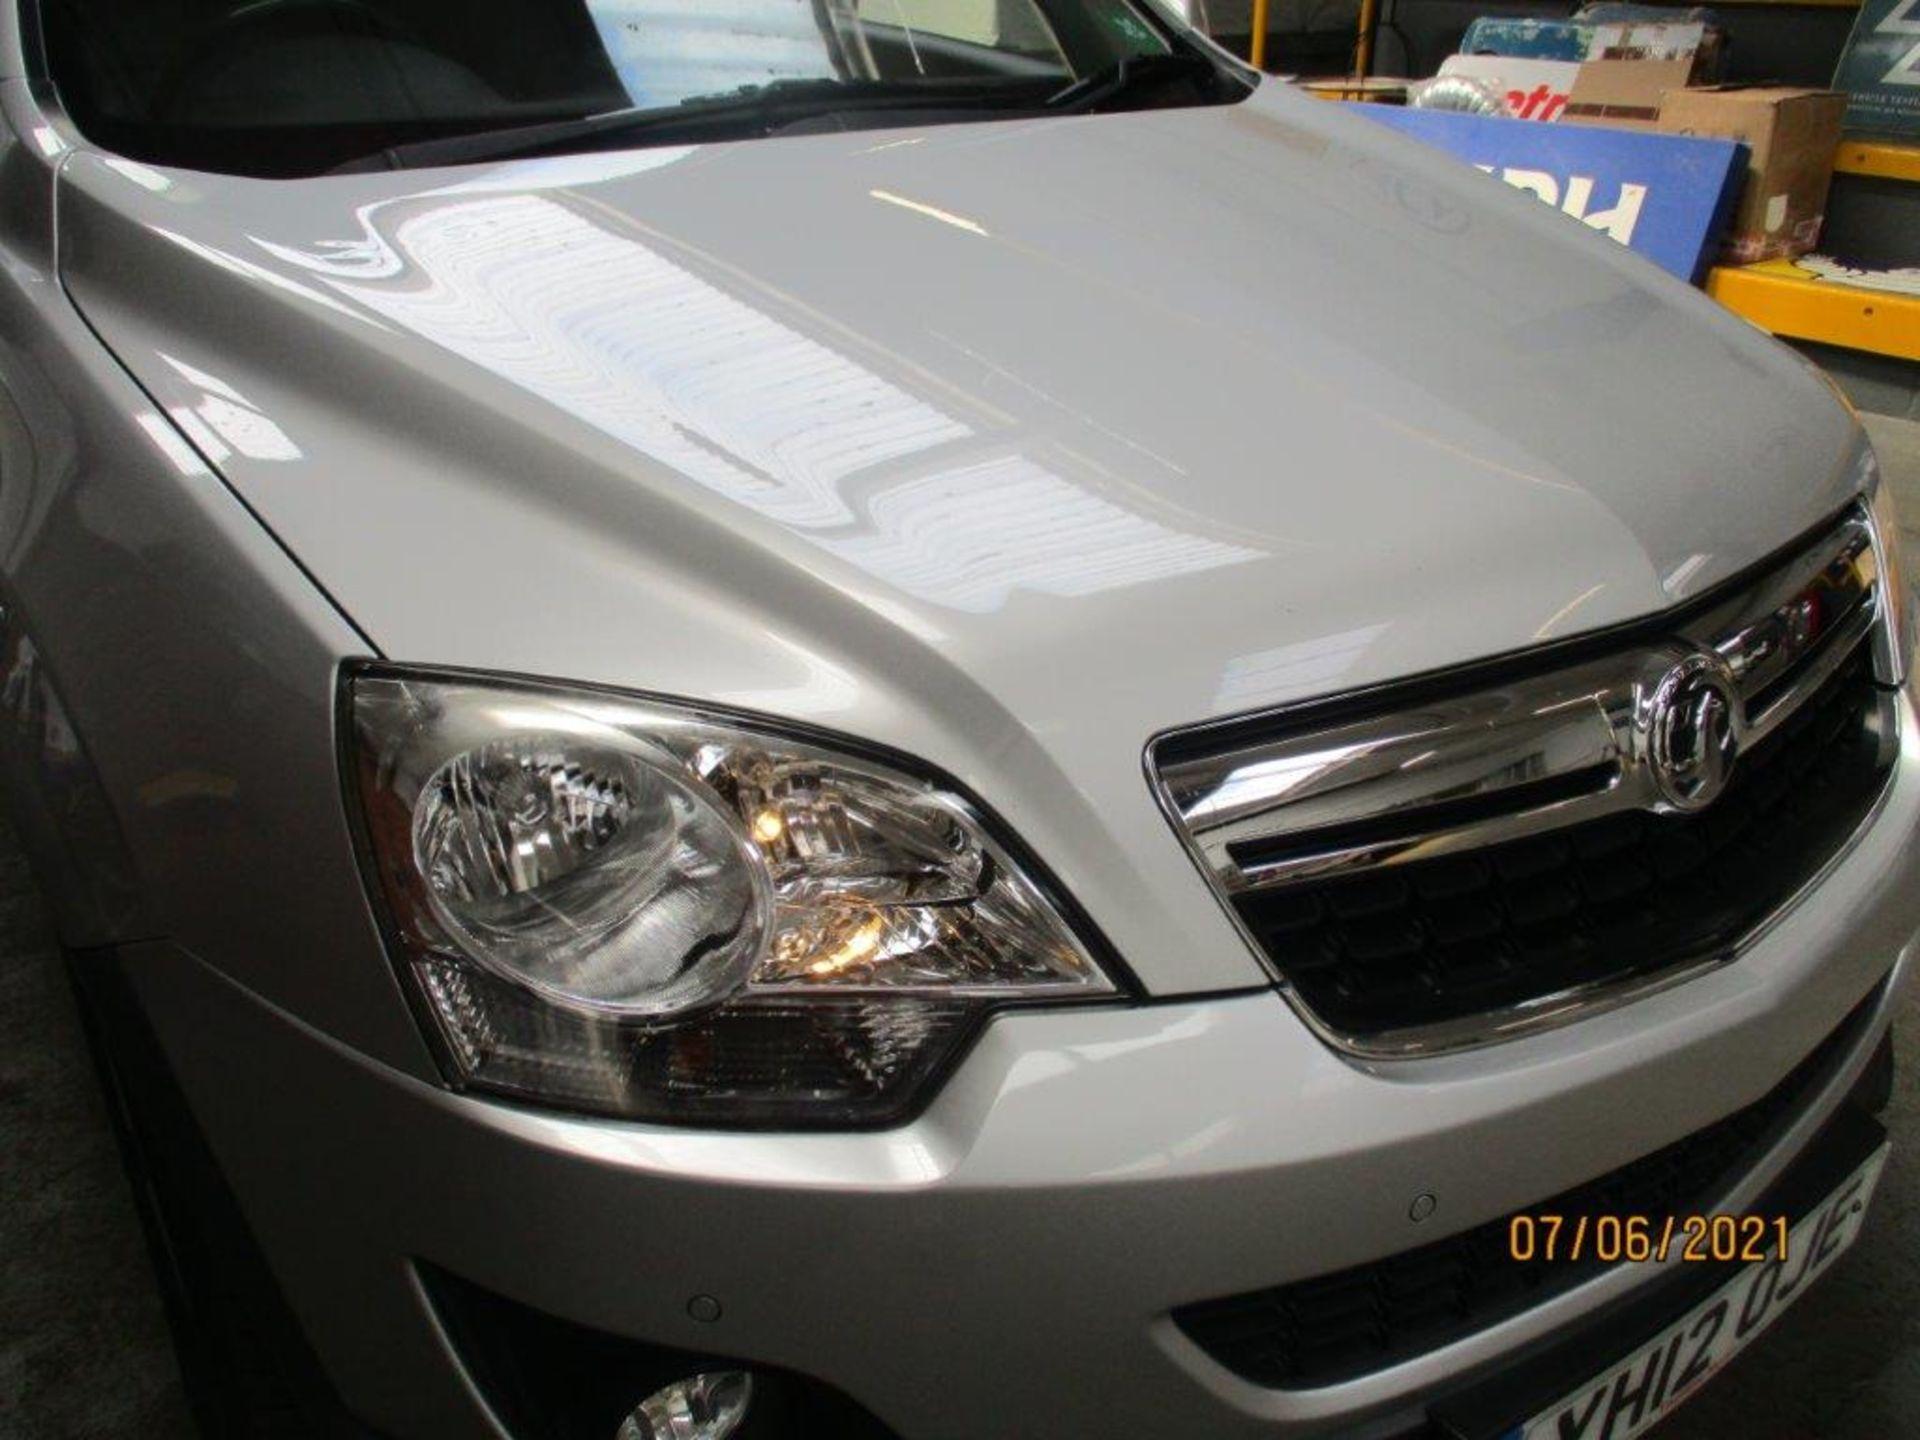 12 12 Vauxhall Antara Excl CDTI - Image 12 of 18